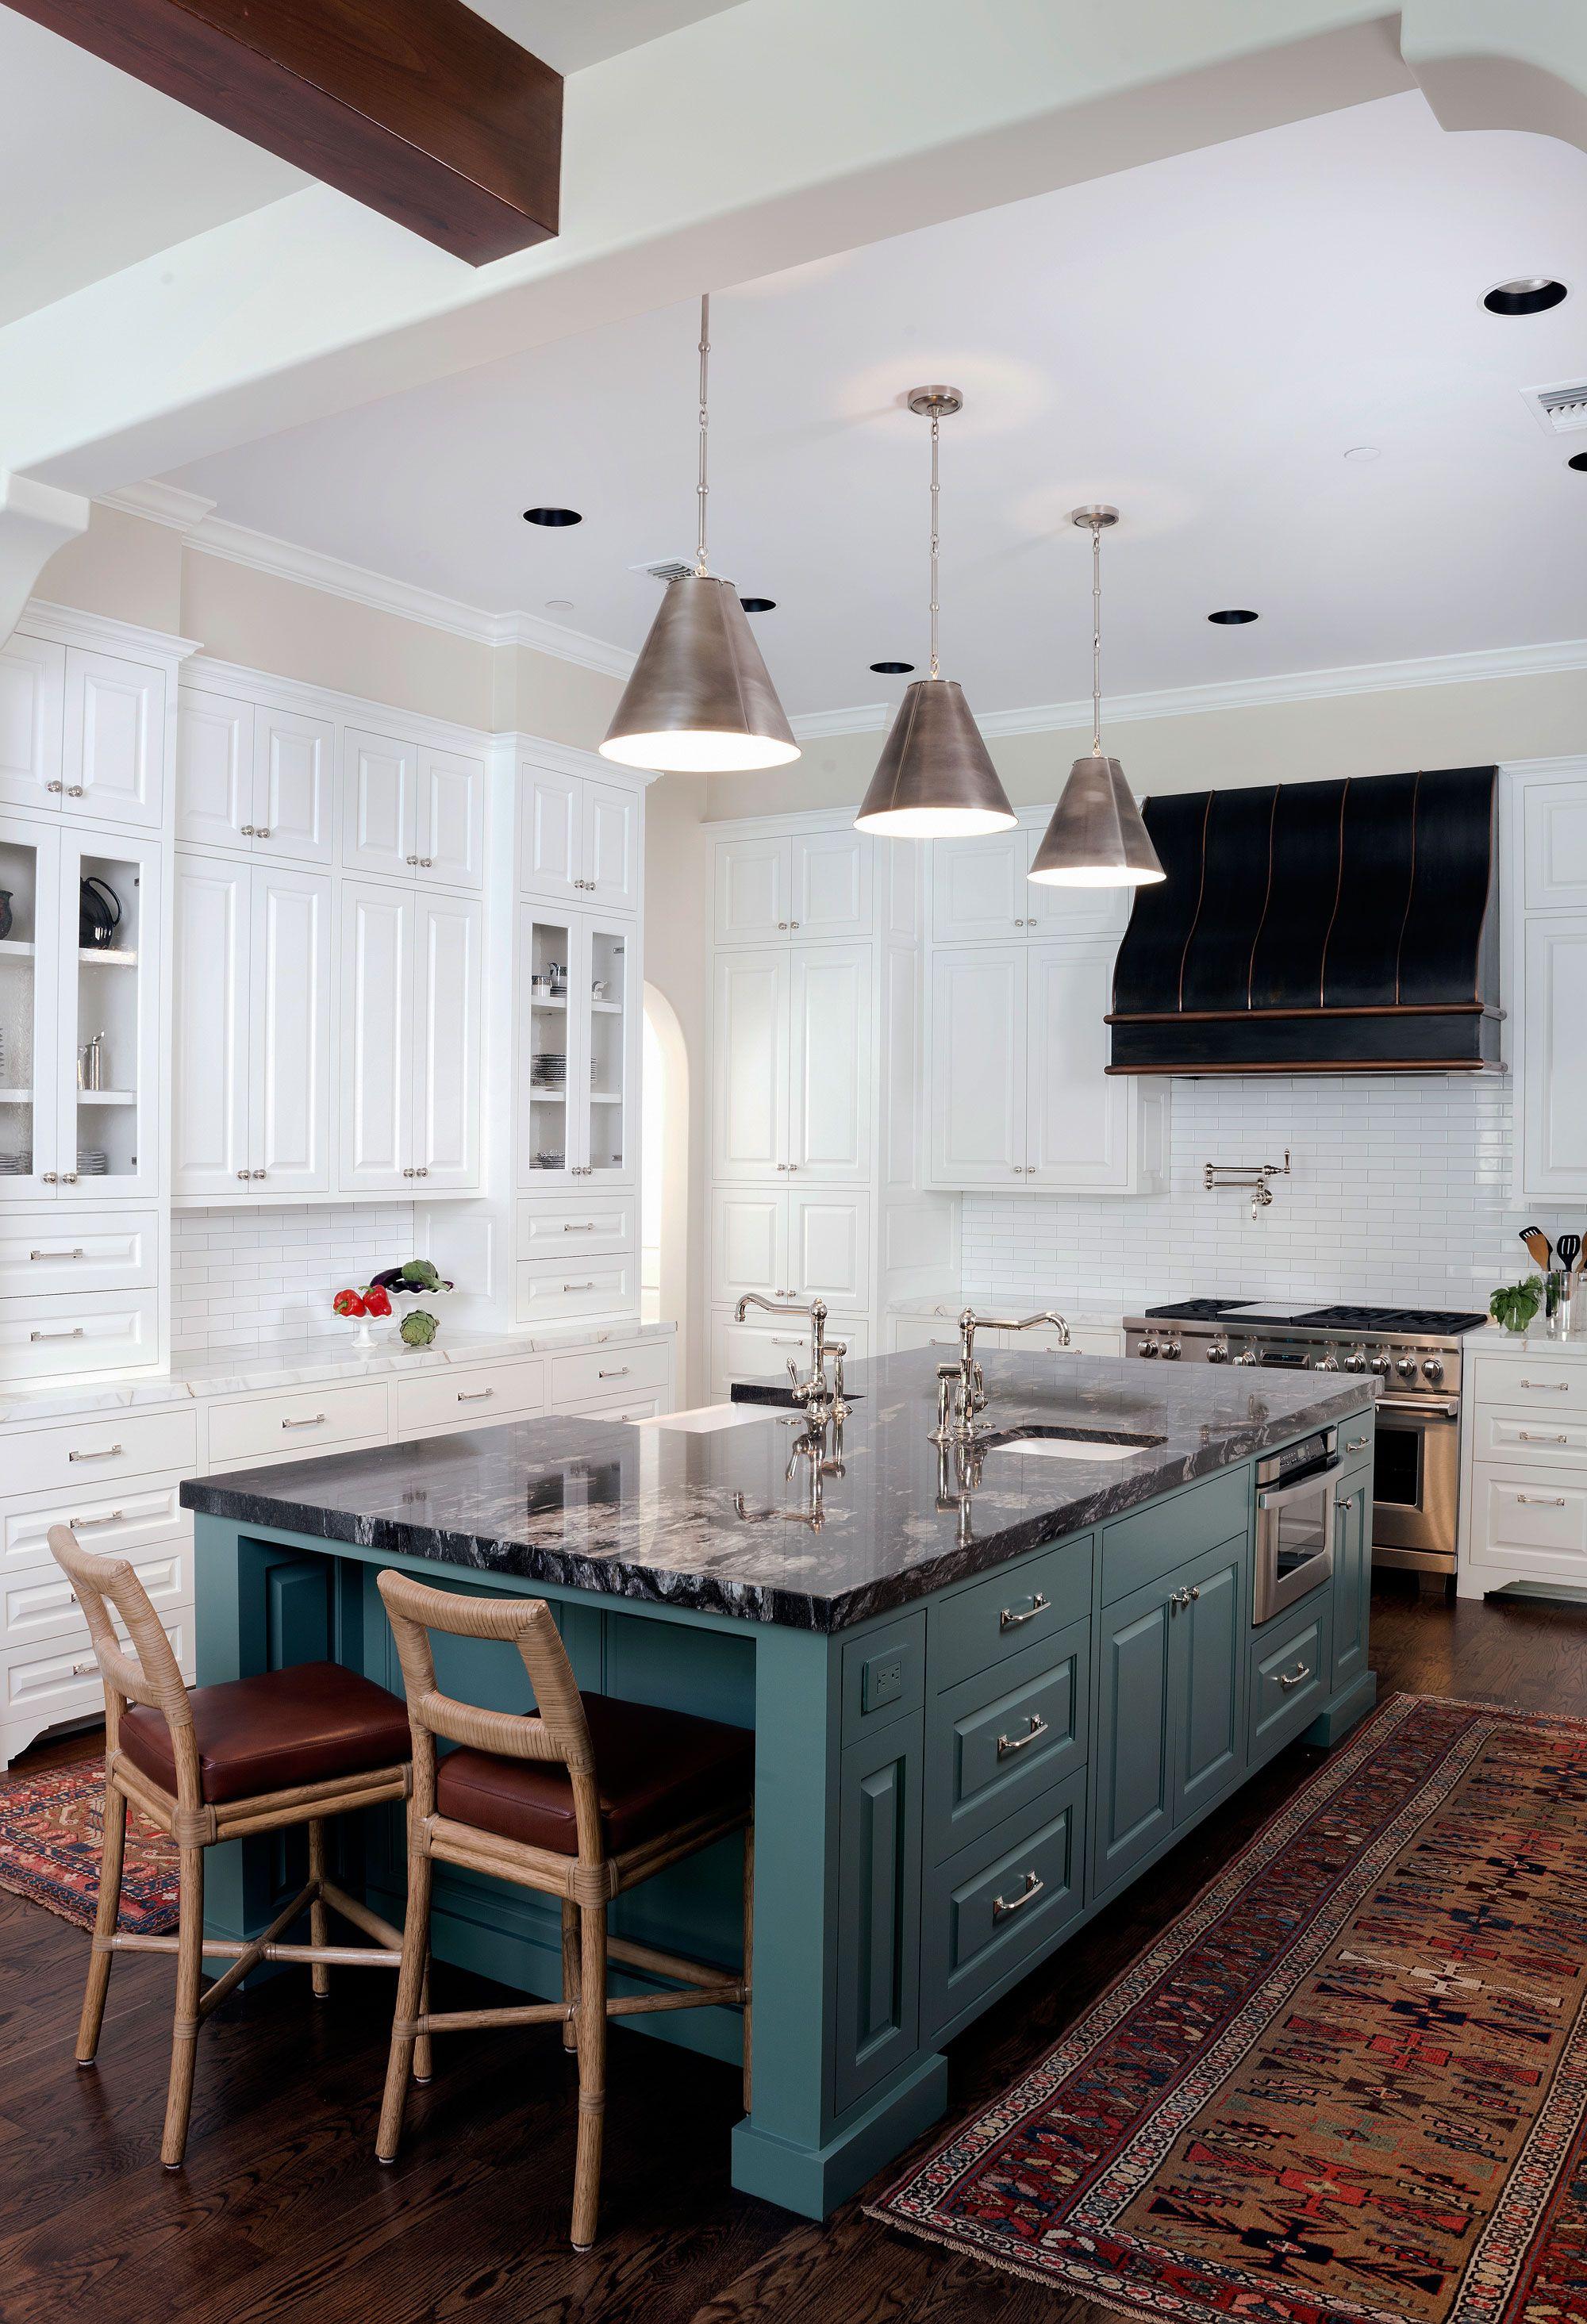 Granite worktops, granite and granite kitchen worktops on pinterest